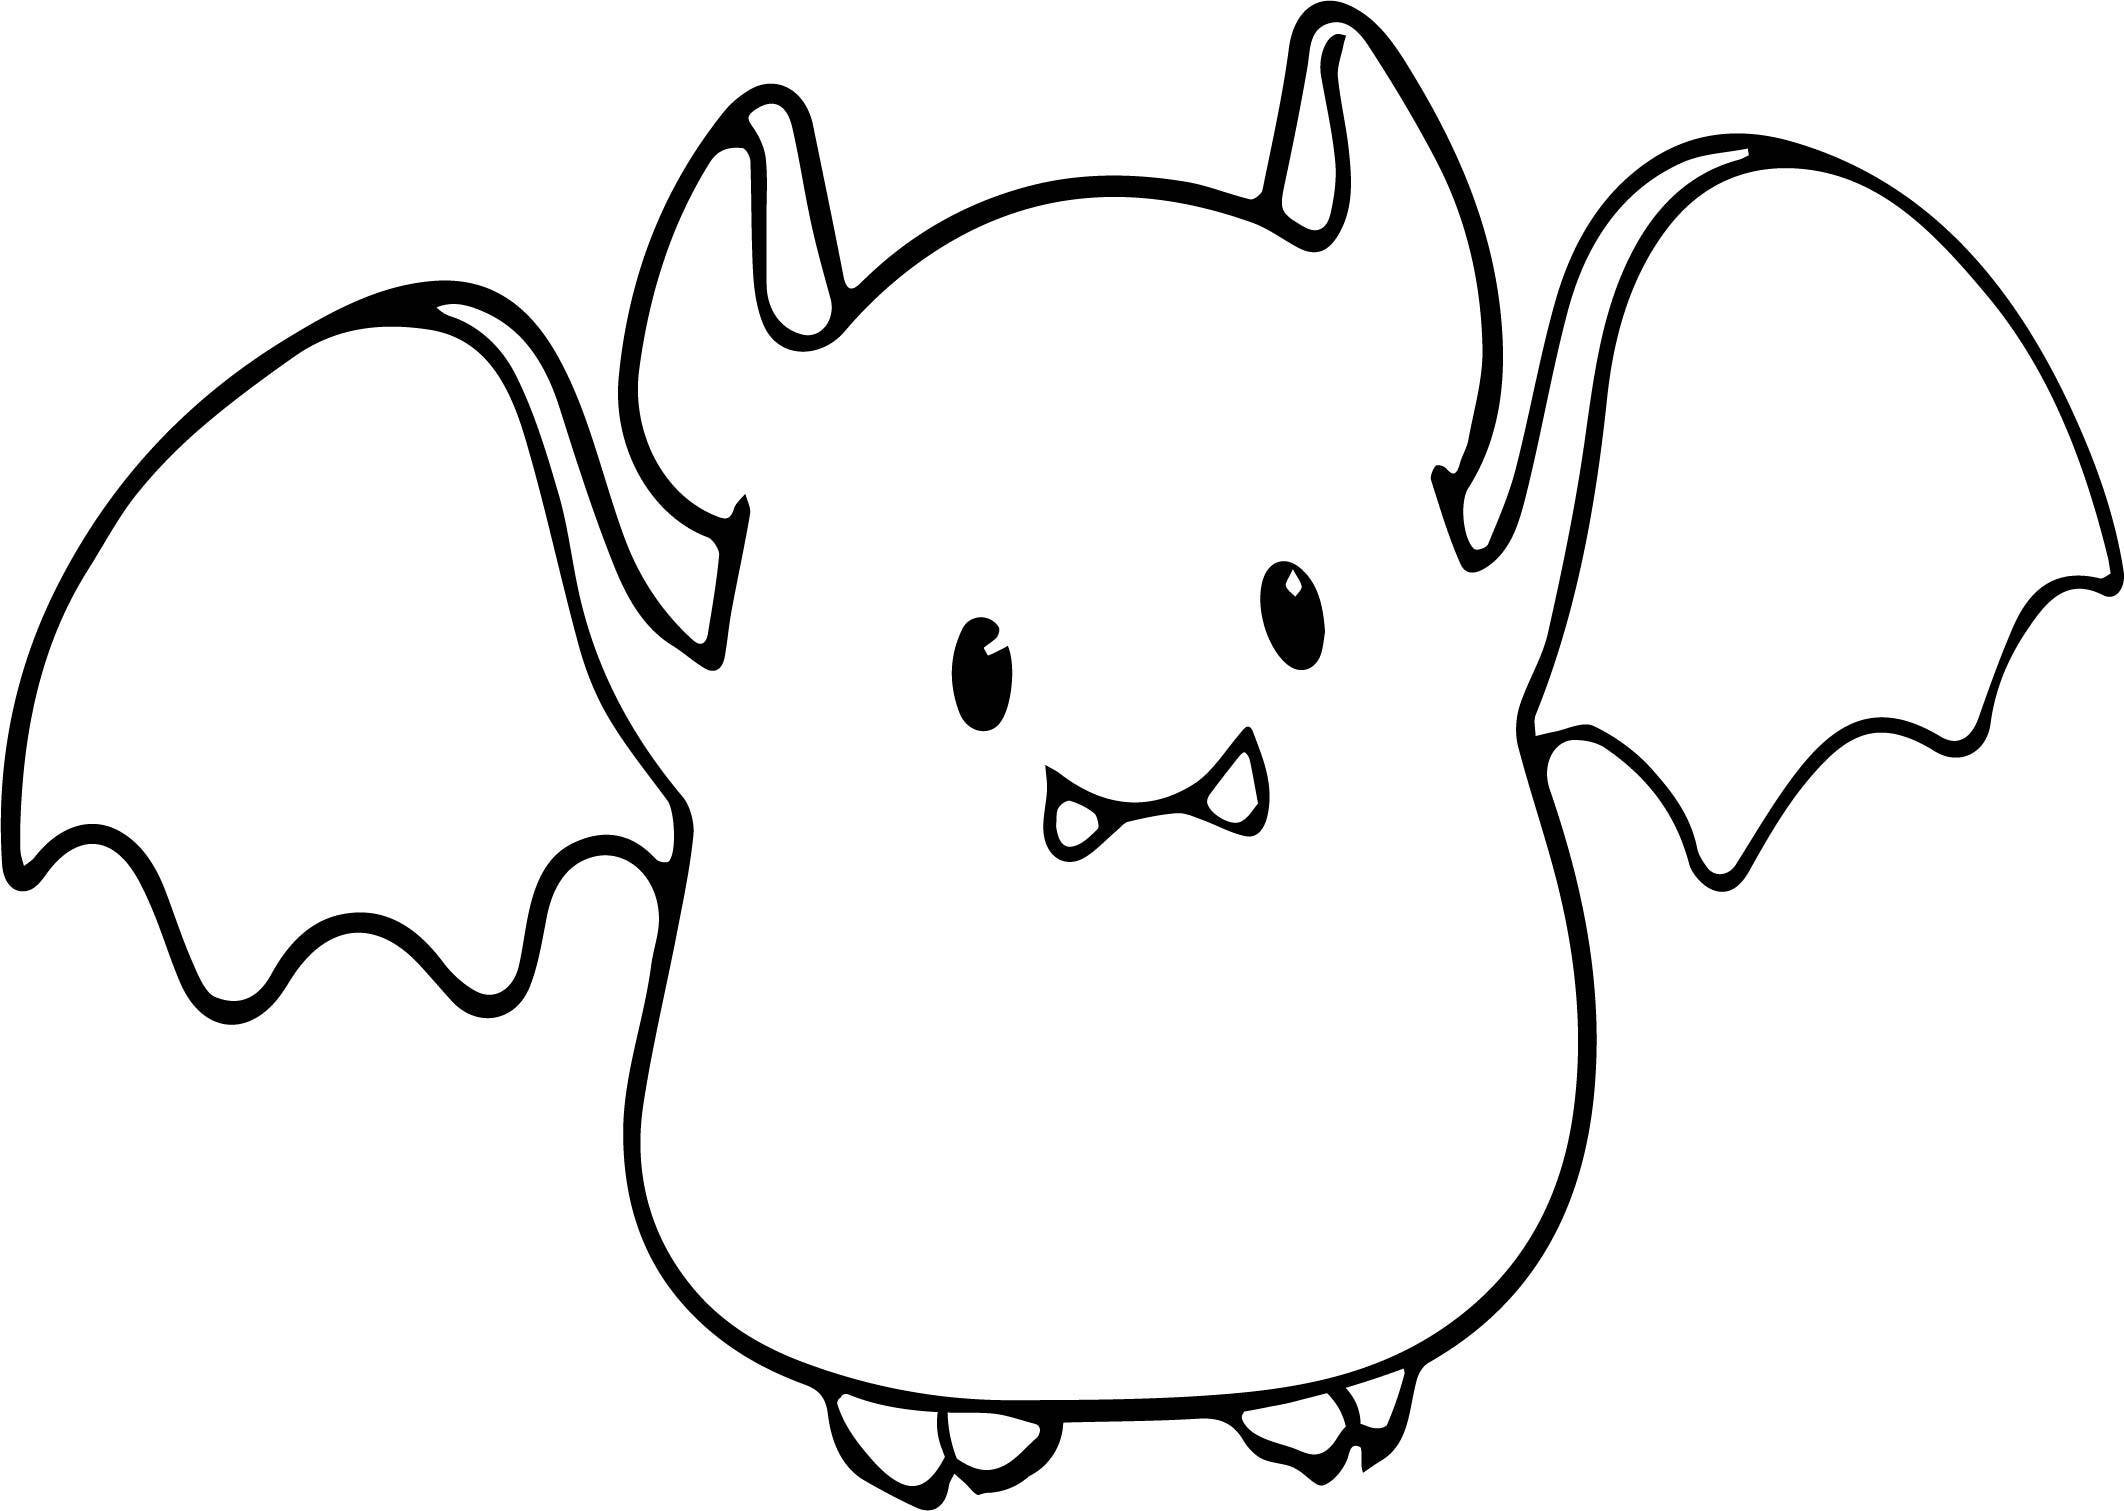 2124x1511 Small Cute Baby Cartoon Vampire Bat Coloring Page Wecoloringpage